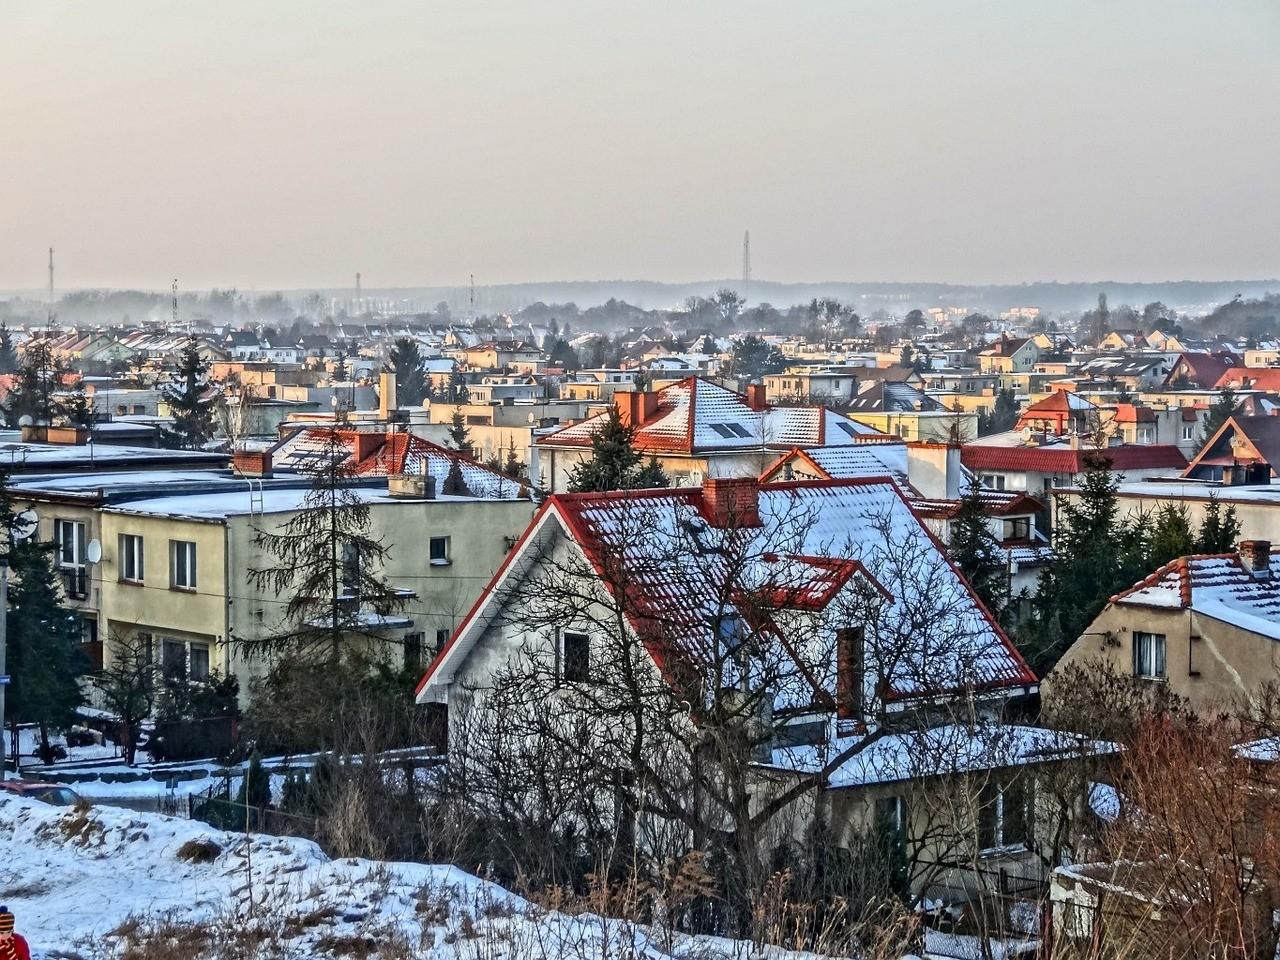 Experiencia en Bydgoszcz, Polonia, por Michał